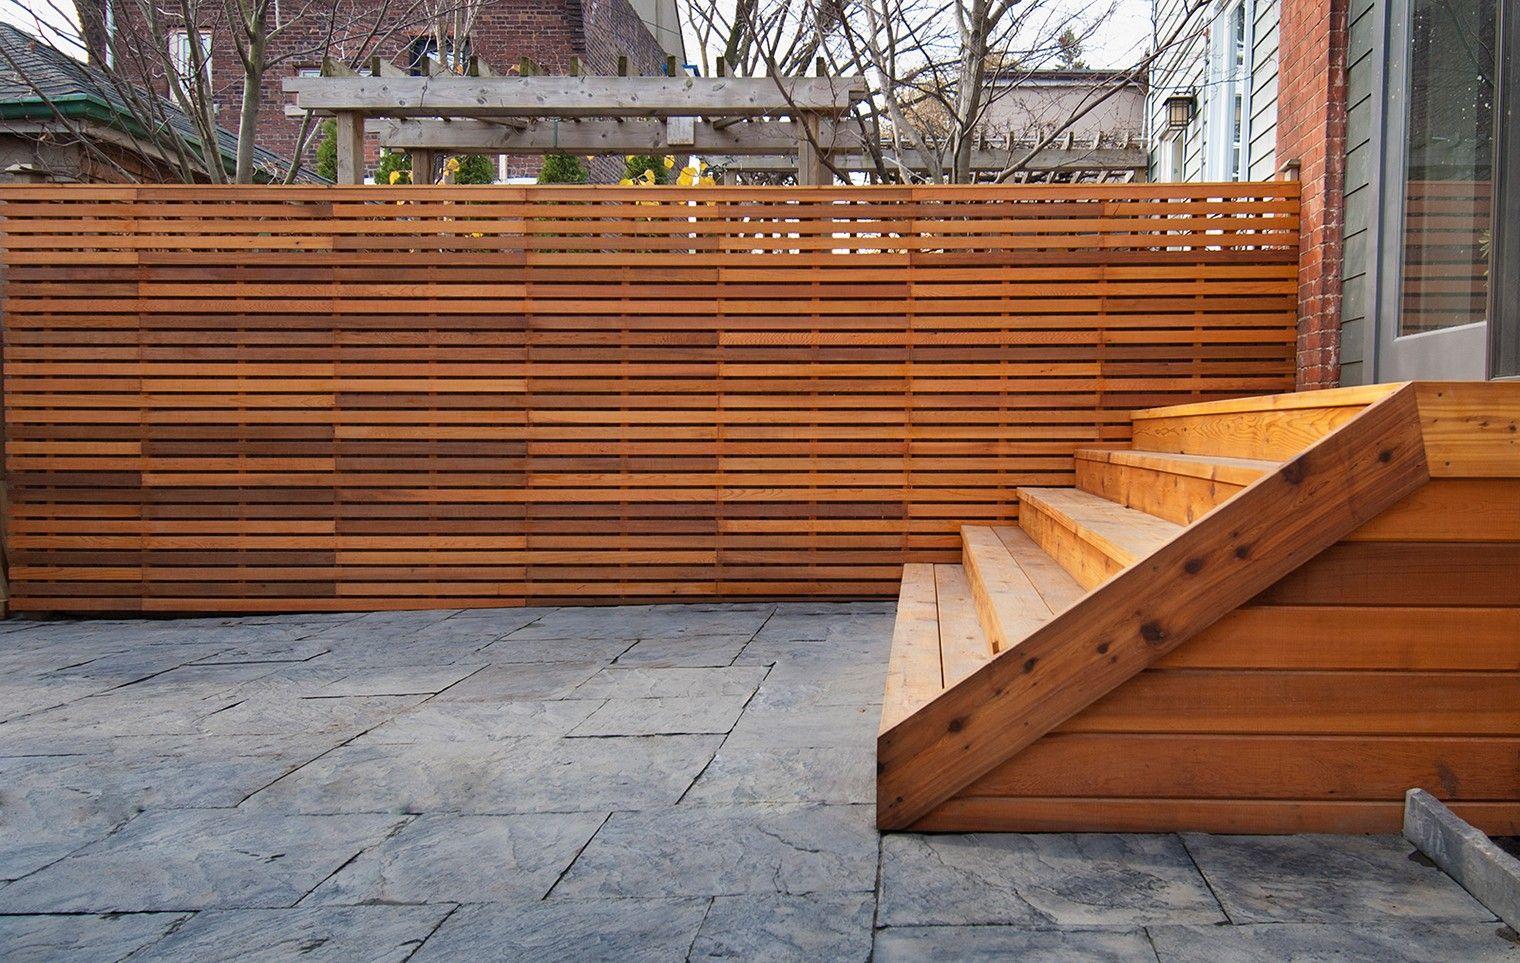 Modern-Wood-Fence-Design.jpg (1520×963) | Modern fence ...